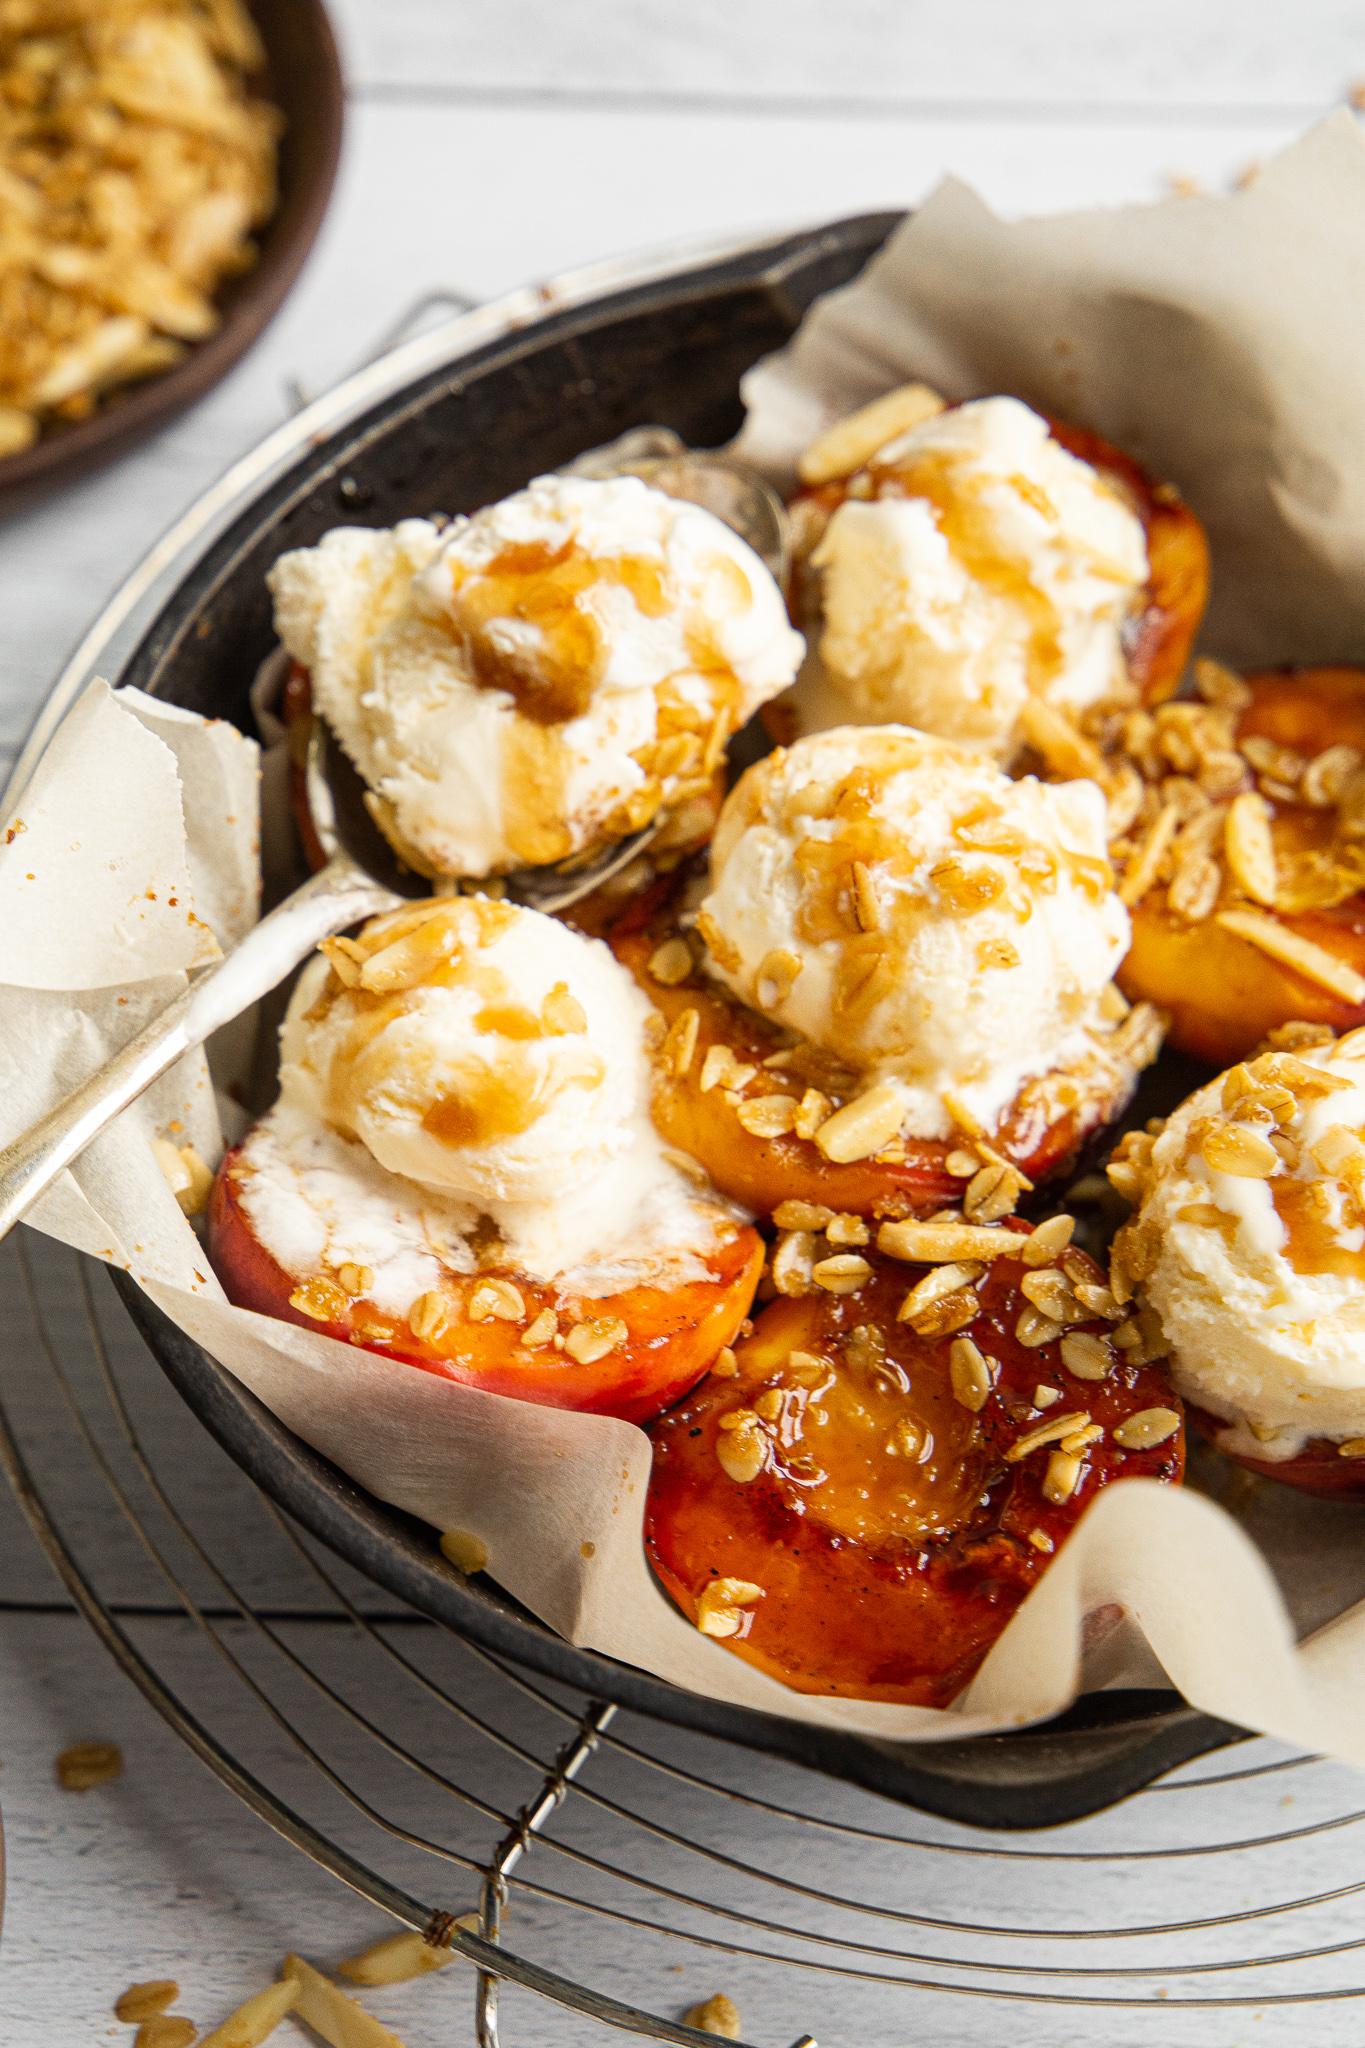 Balsamic and Honey Glazed Peaches